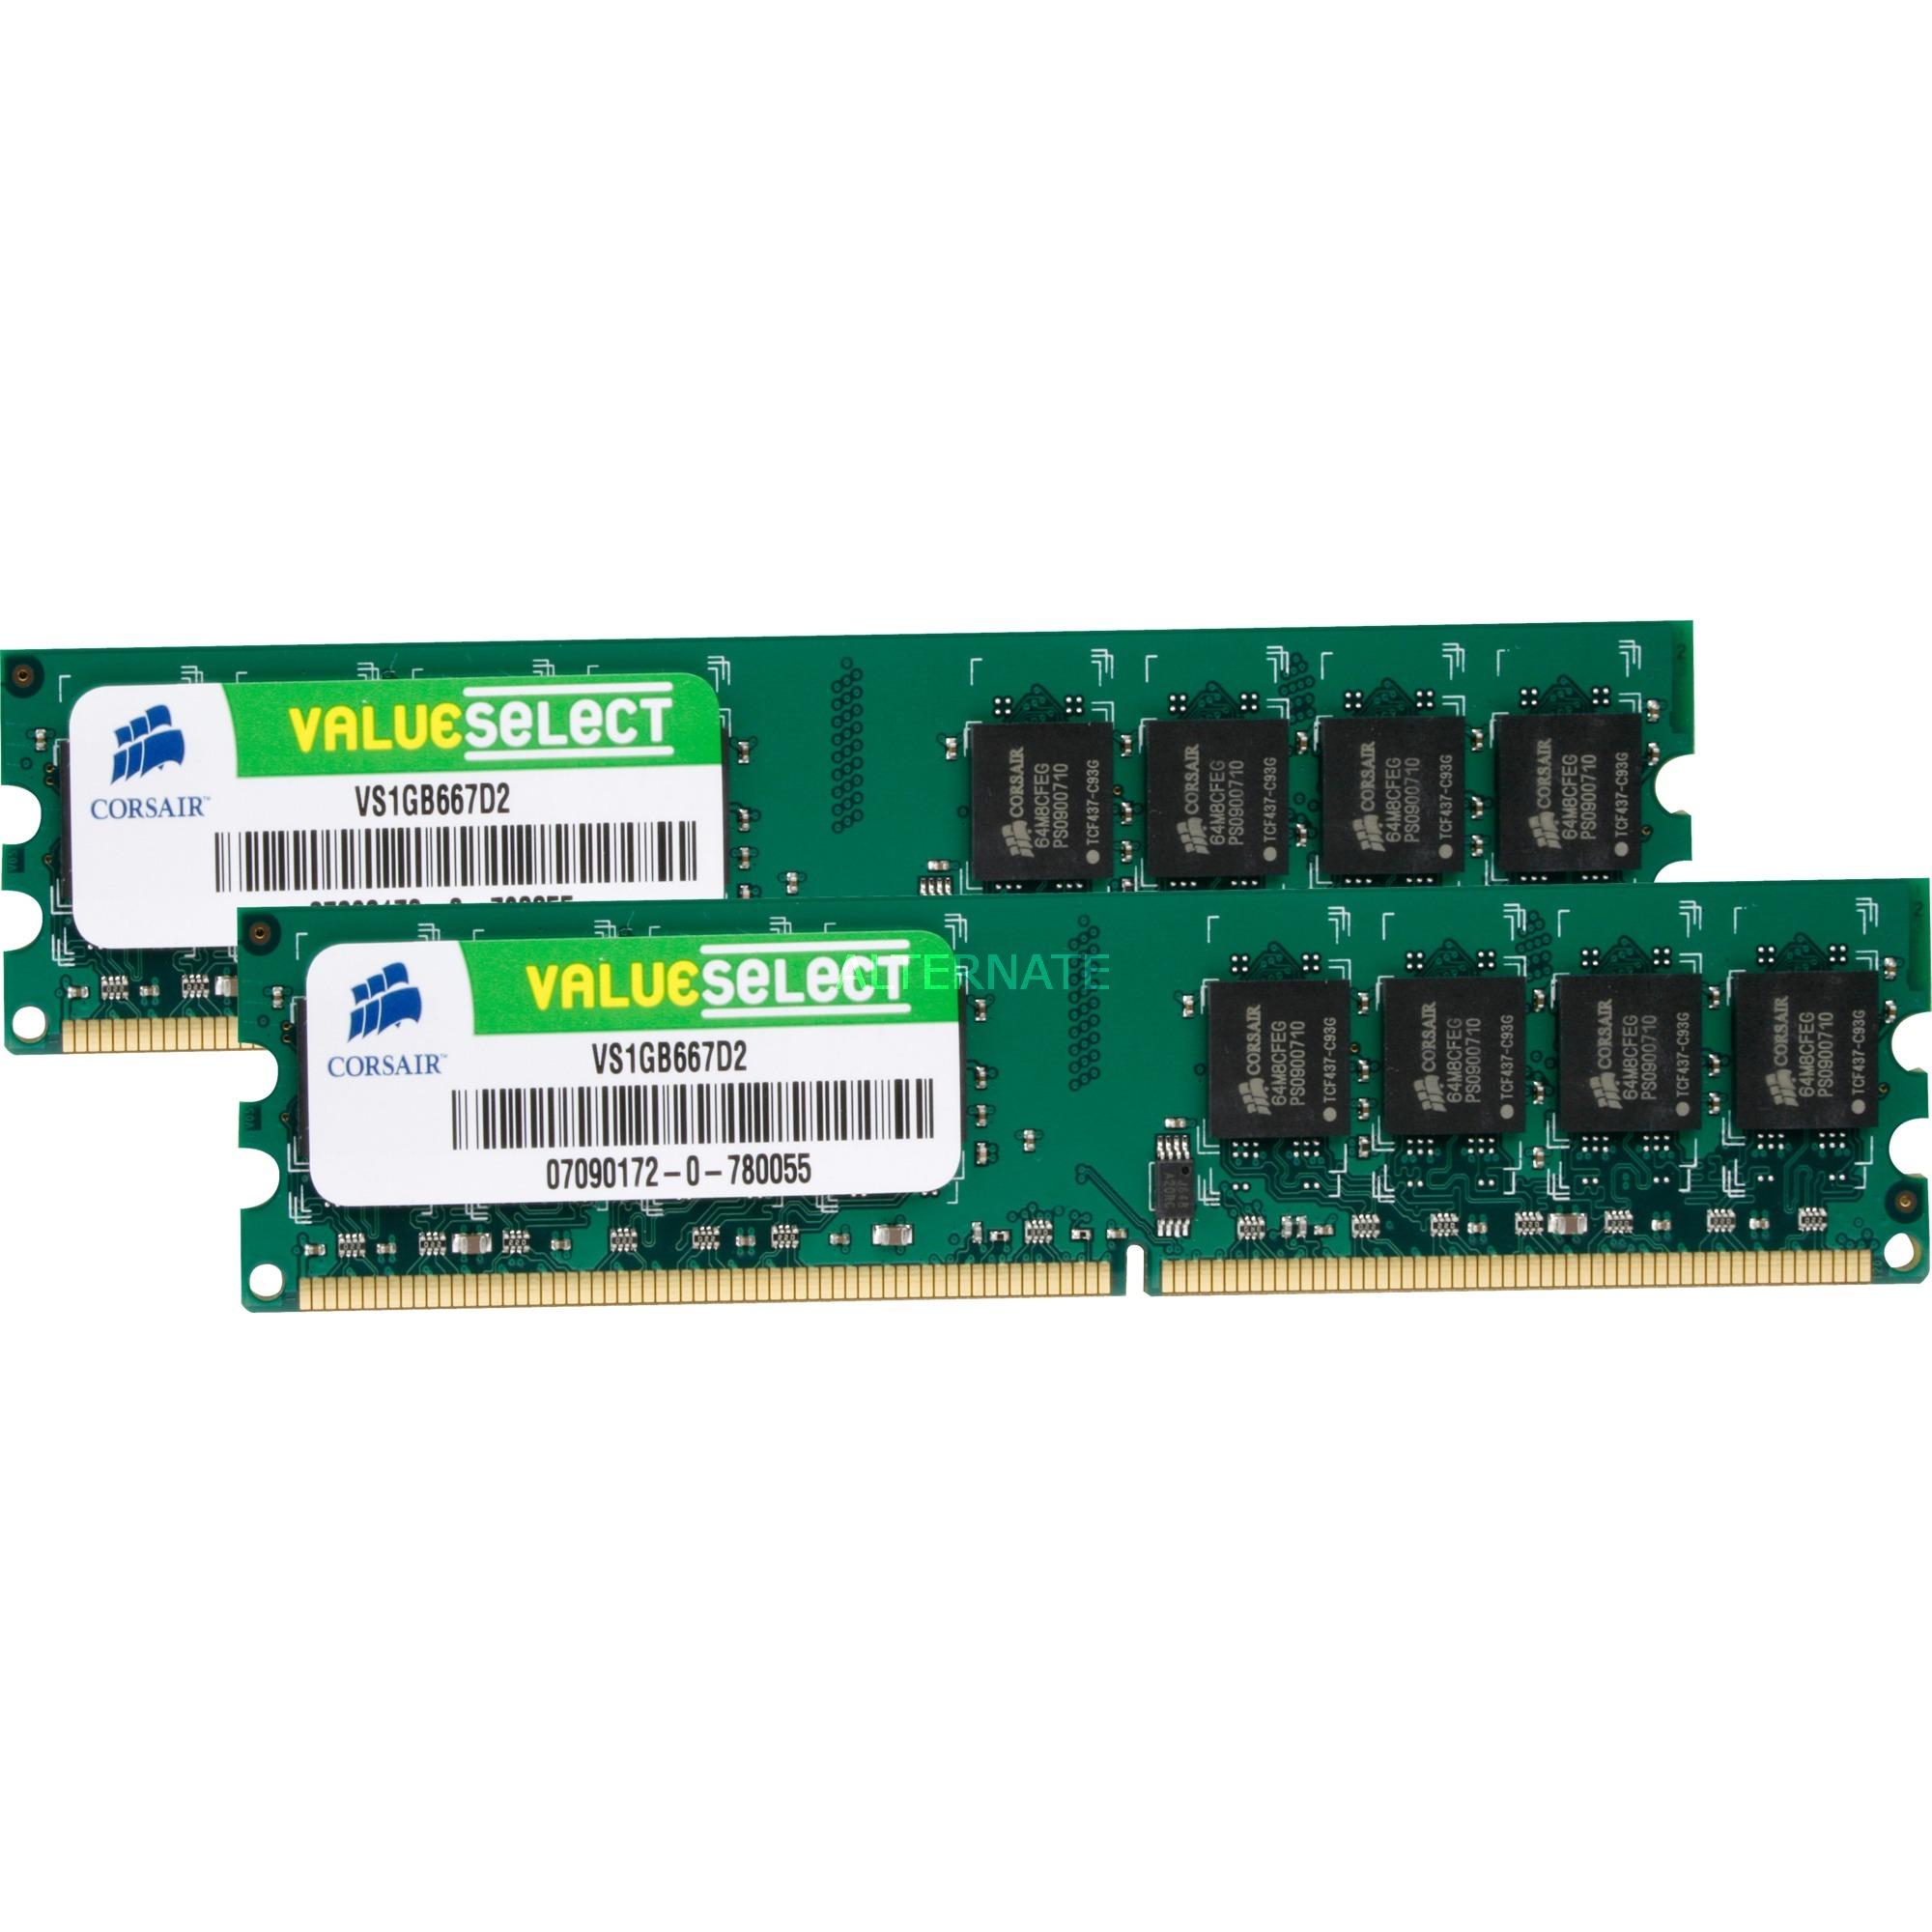 2GB DDR2 SDRAM DIMMs 2GB DDR2 667MHz módulo de memoria, Memoria RAM